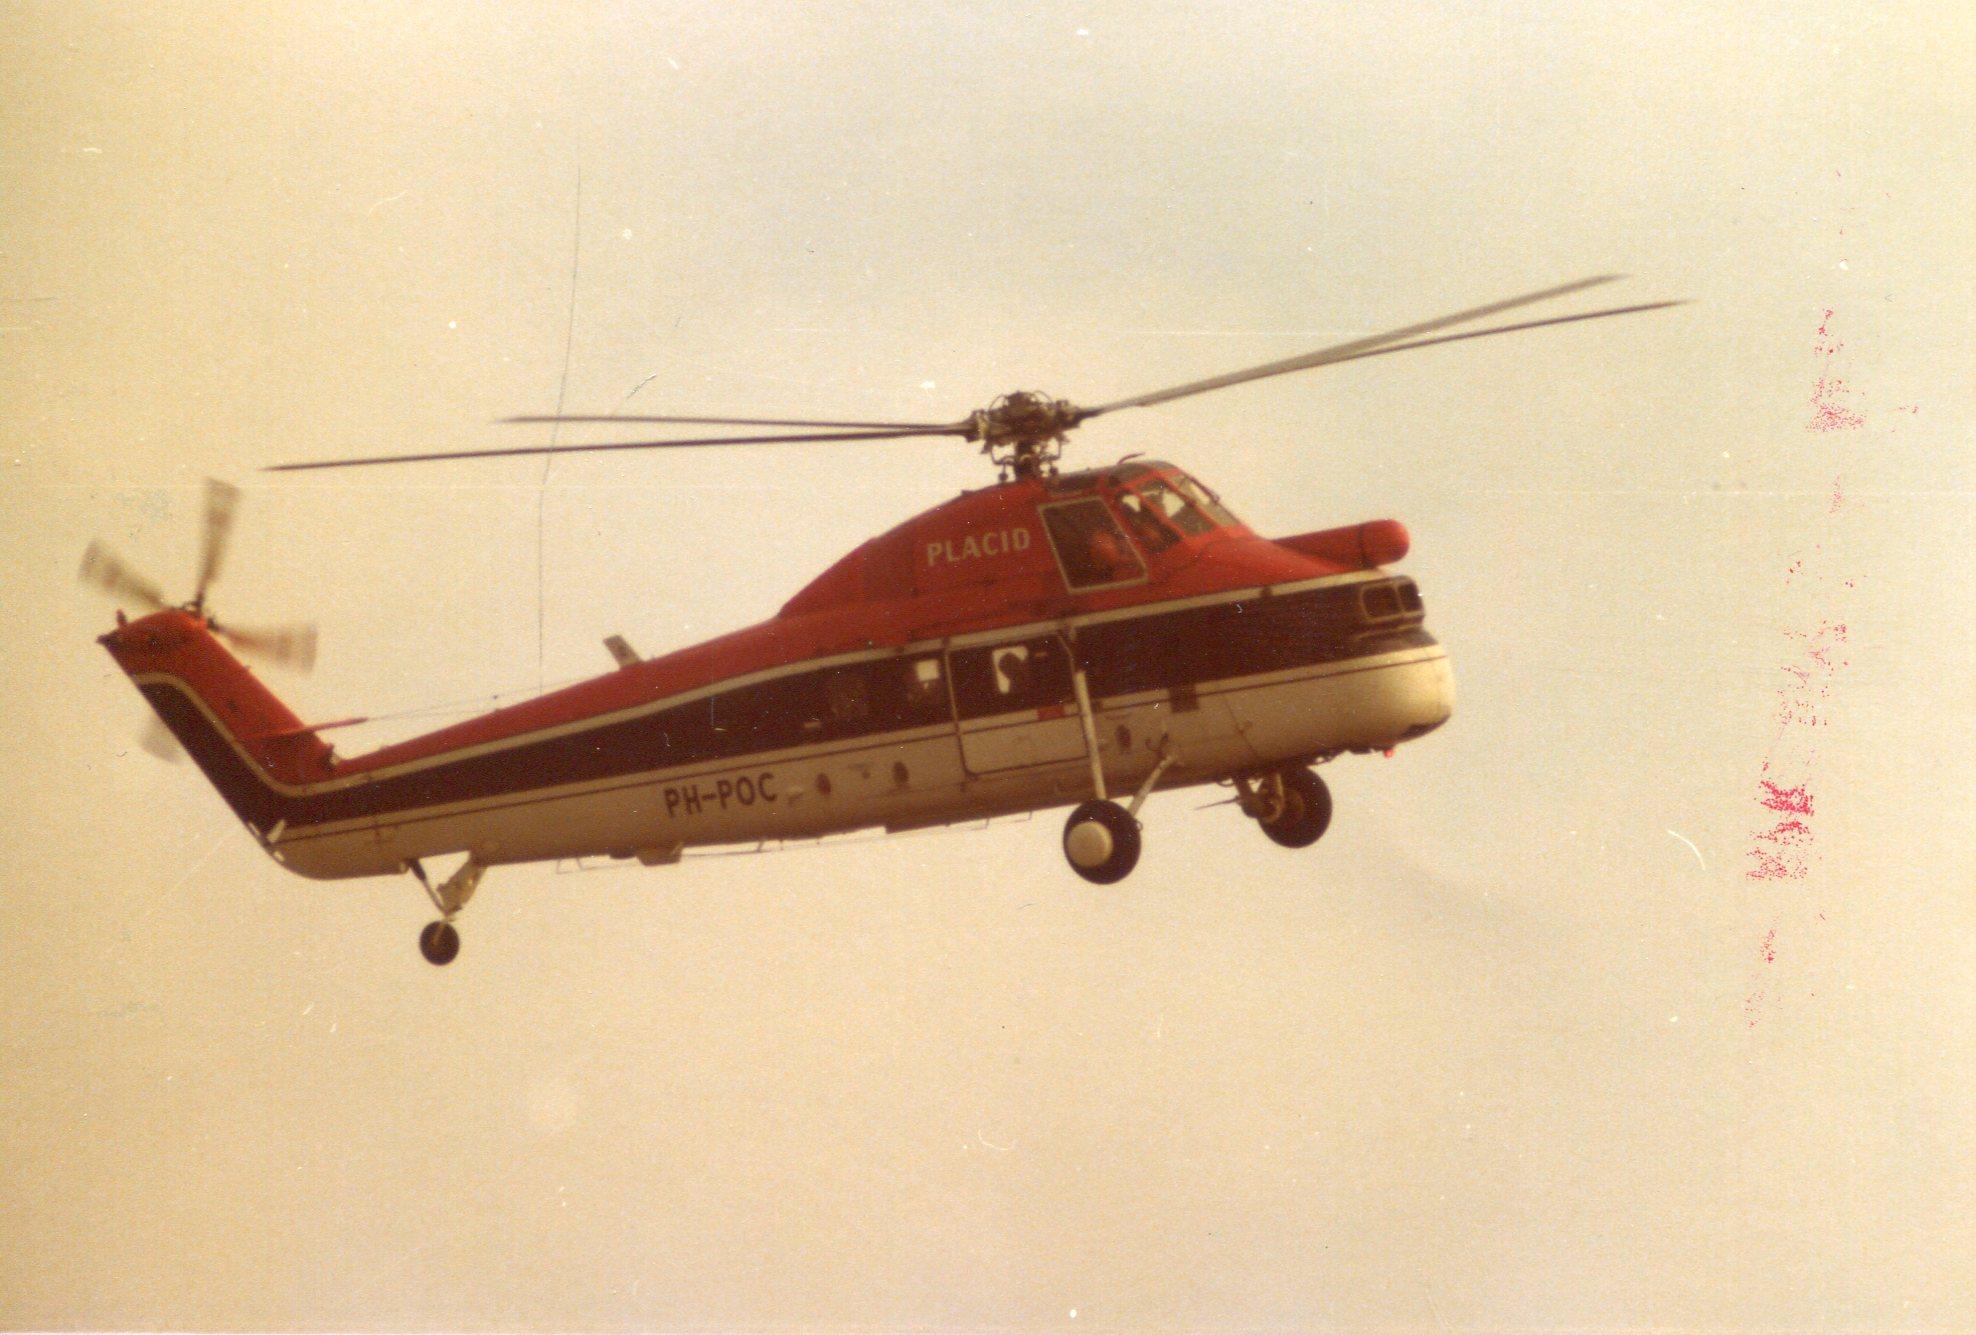 Naam: Den Helder , april 1977 (3).jpg Bekeken: 211 Grootte: 334,4 KB